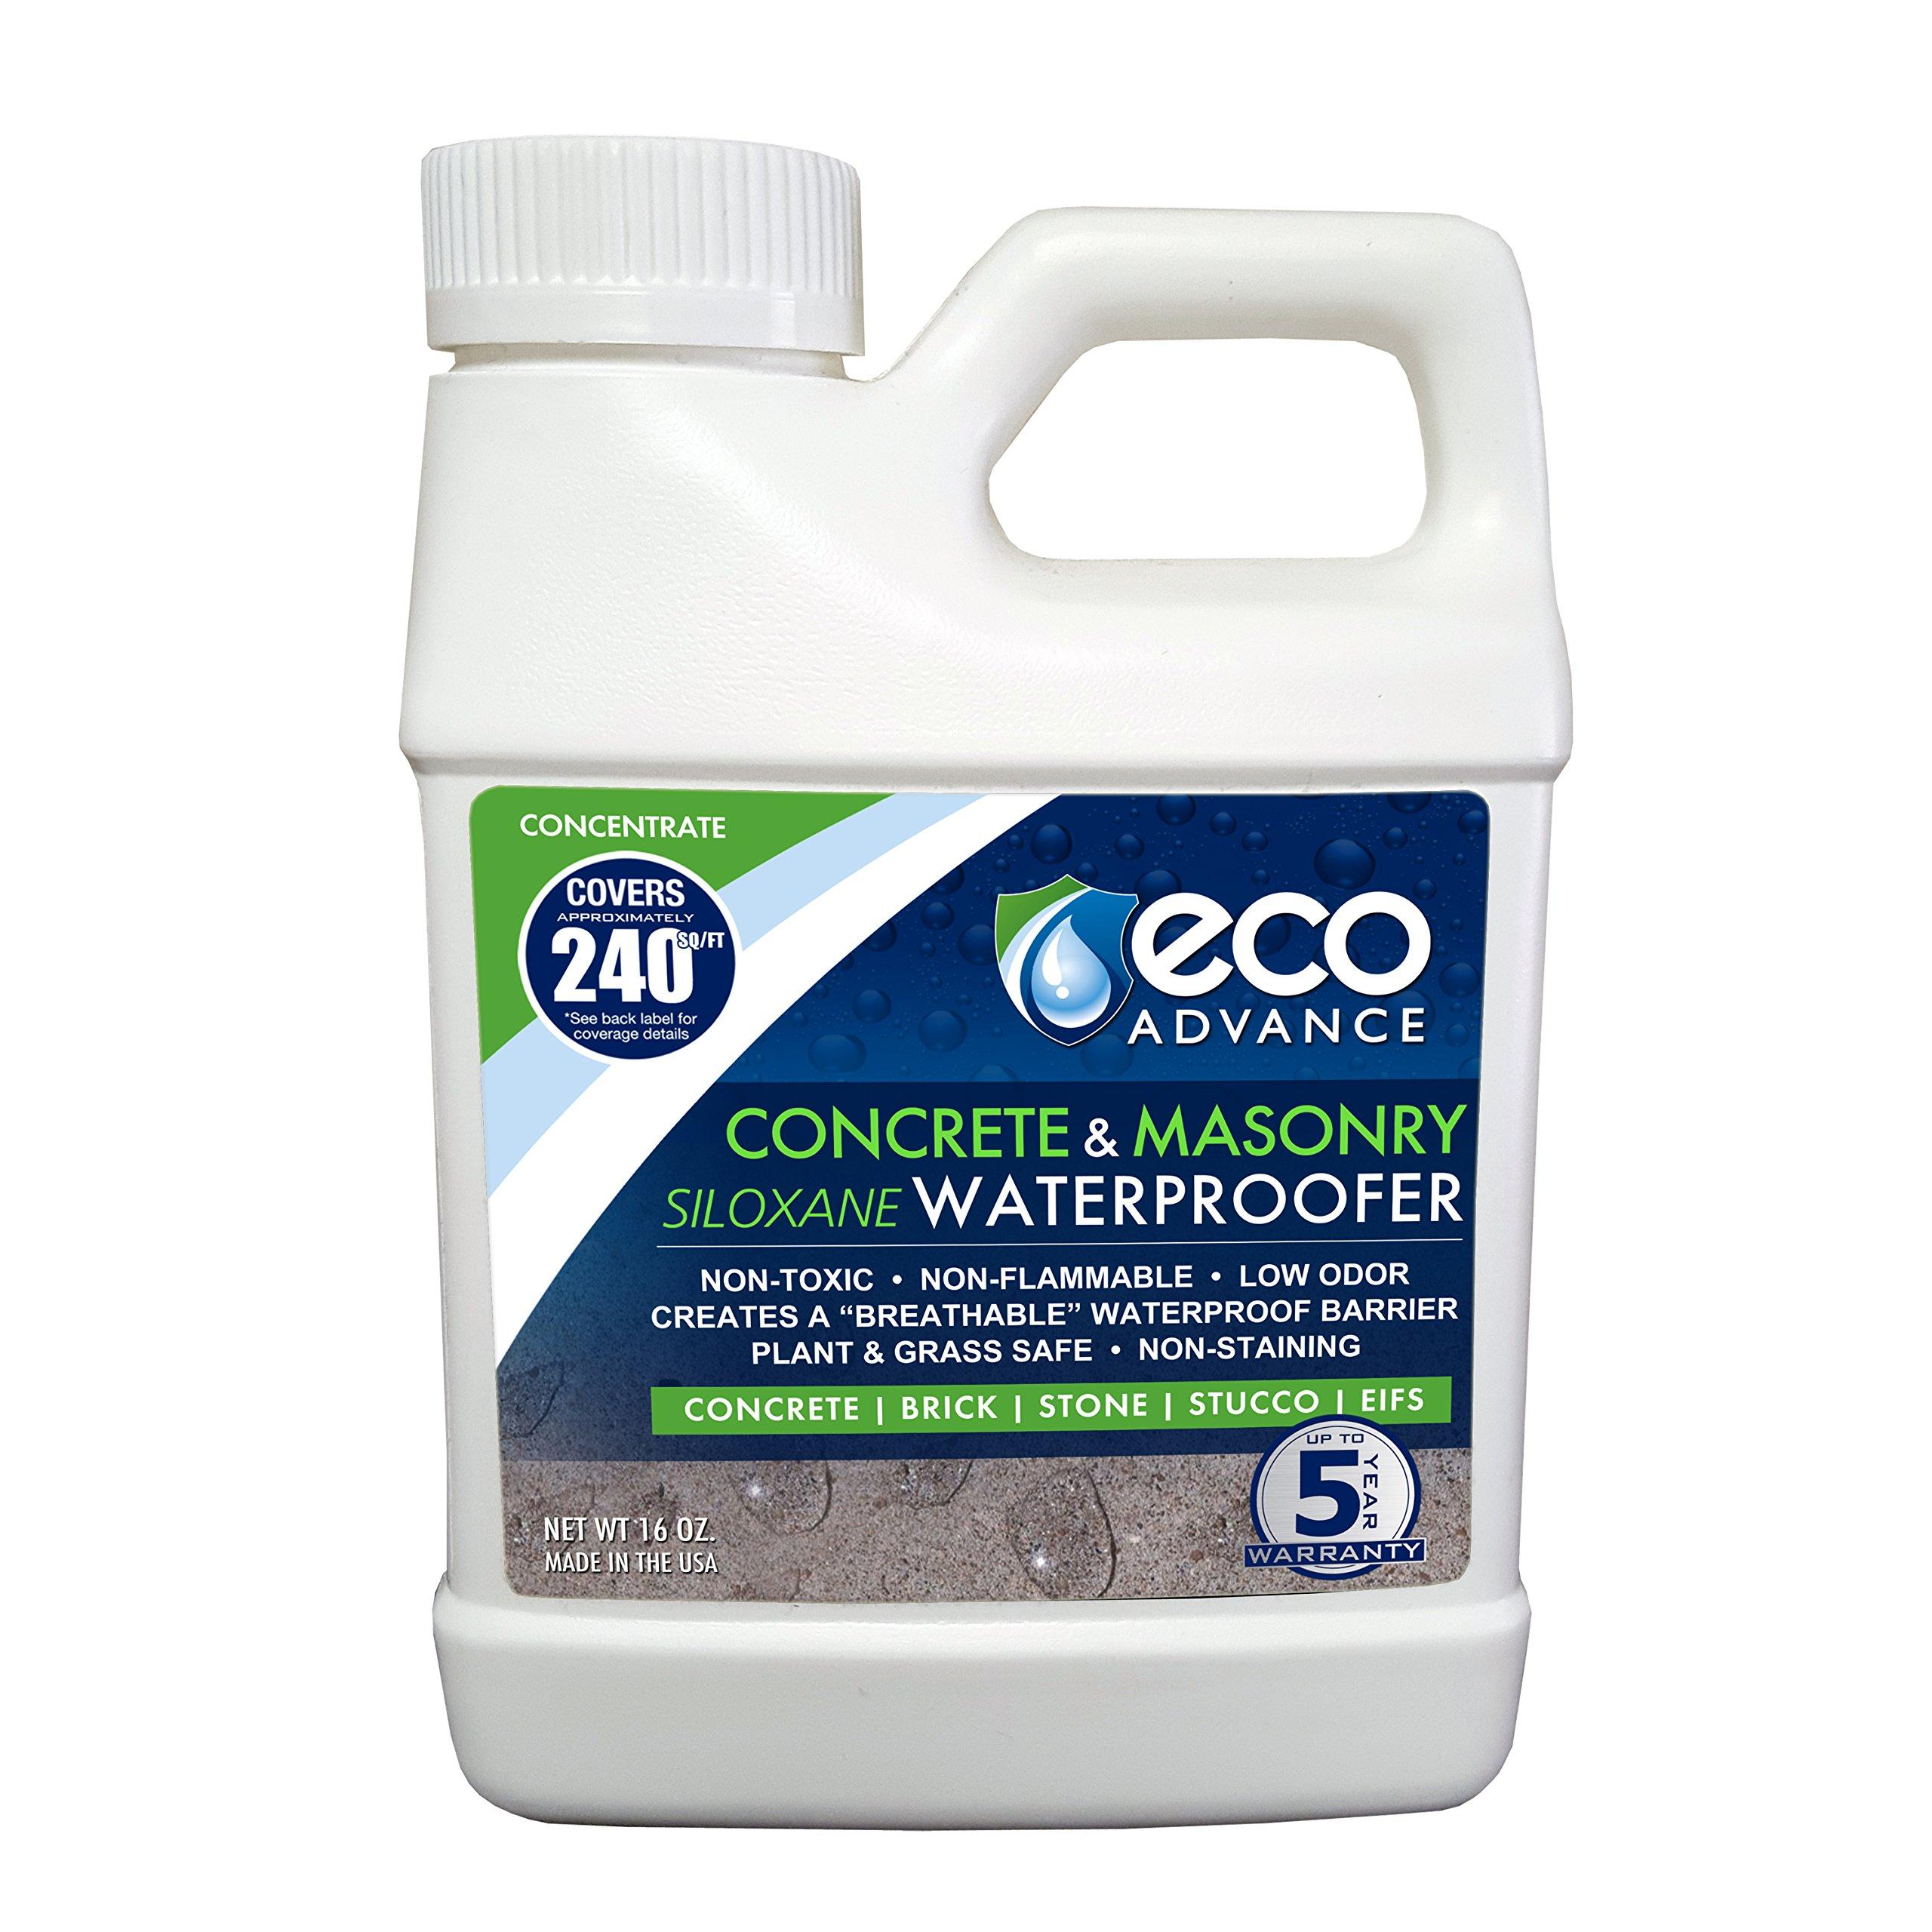 Eco Advance EACON16CON Concrete/Masonry Siloxane Waterproofer Liquid Concentrate 16-Oz Water Proofer